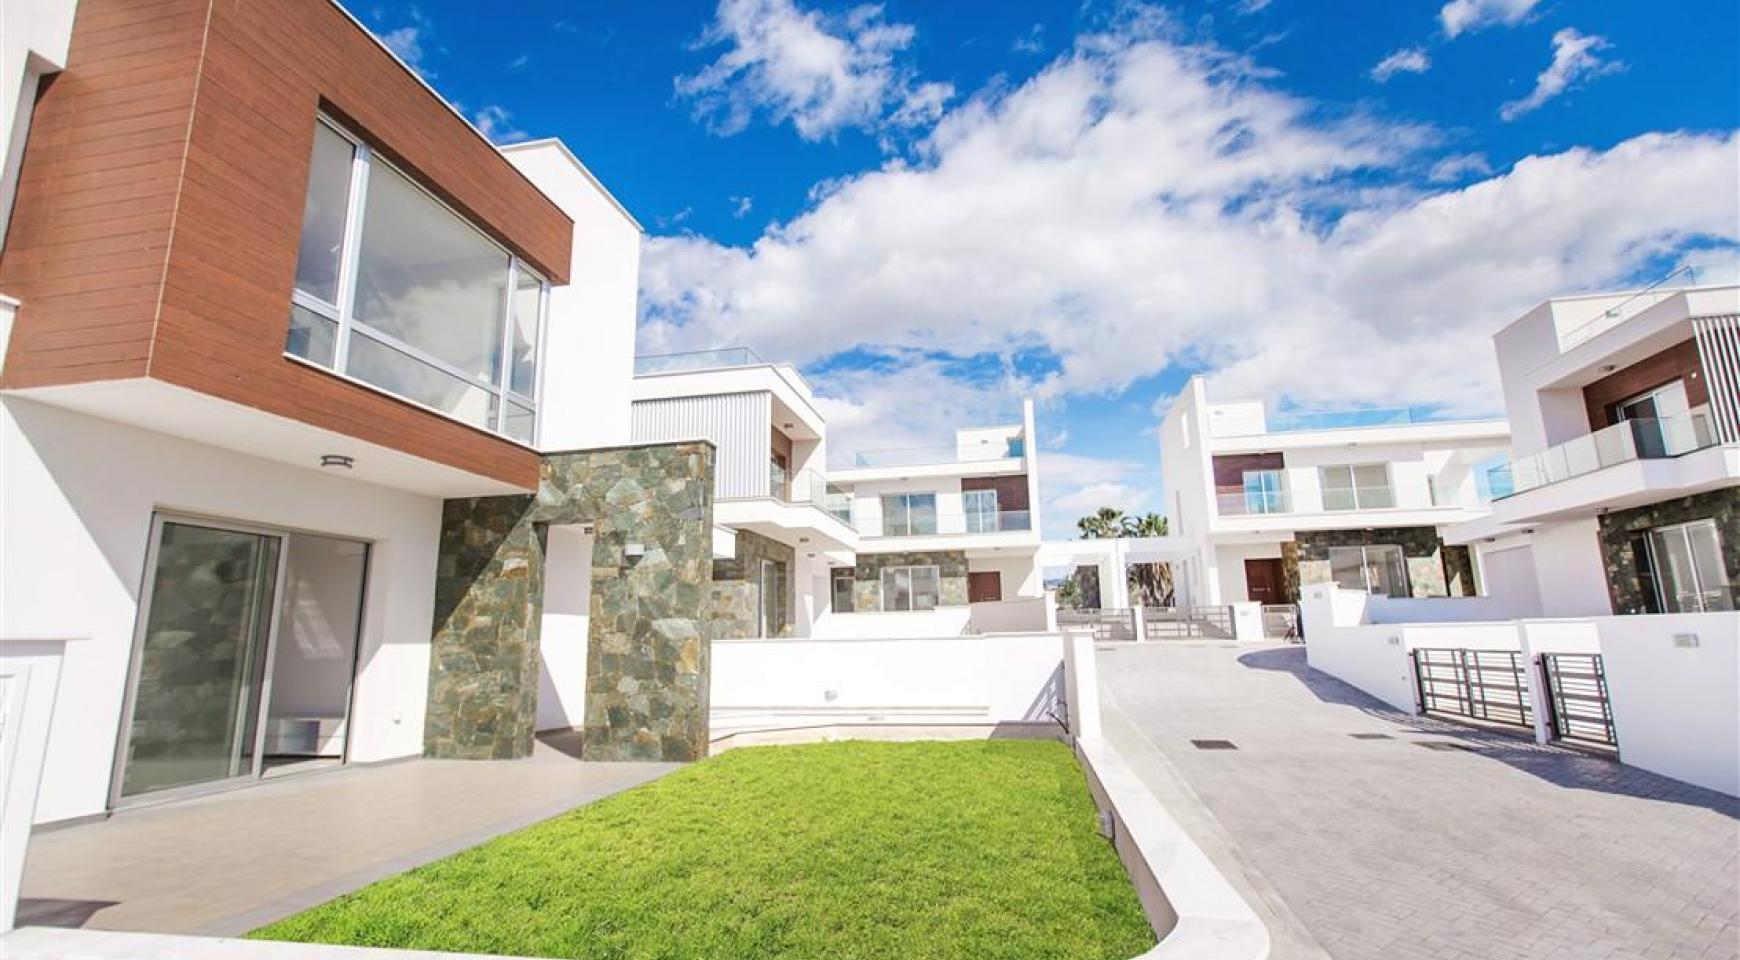 3 Bedroom Villa in Chloraka - 1